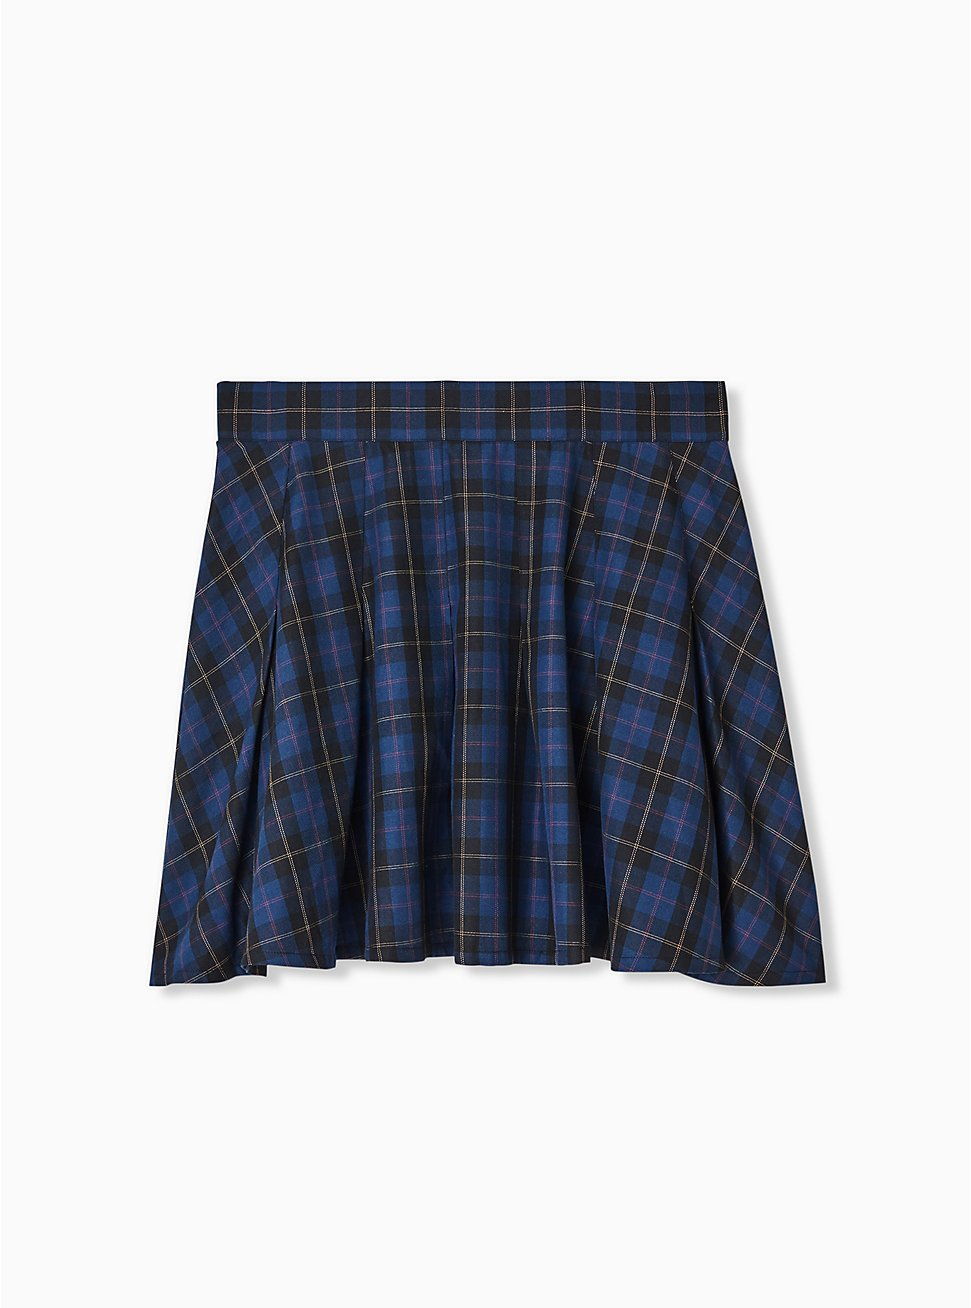 Navy Plaid Twill Mini Skater Skirt , PLAID - BLUE, hi-res